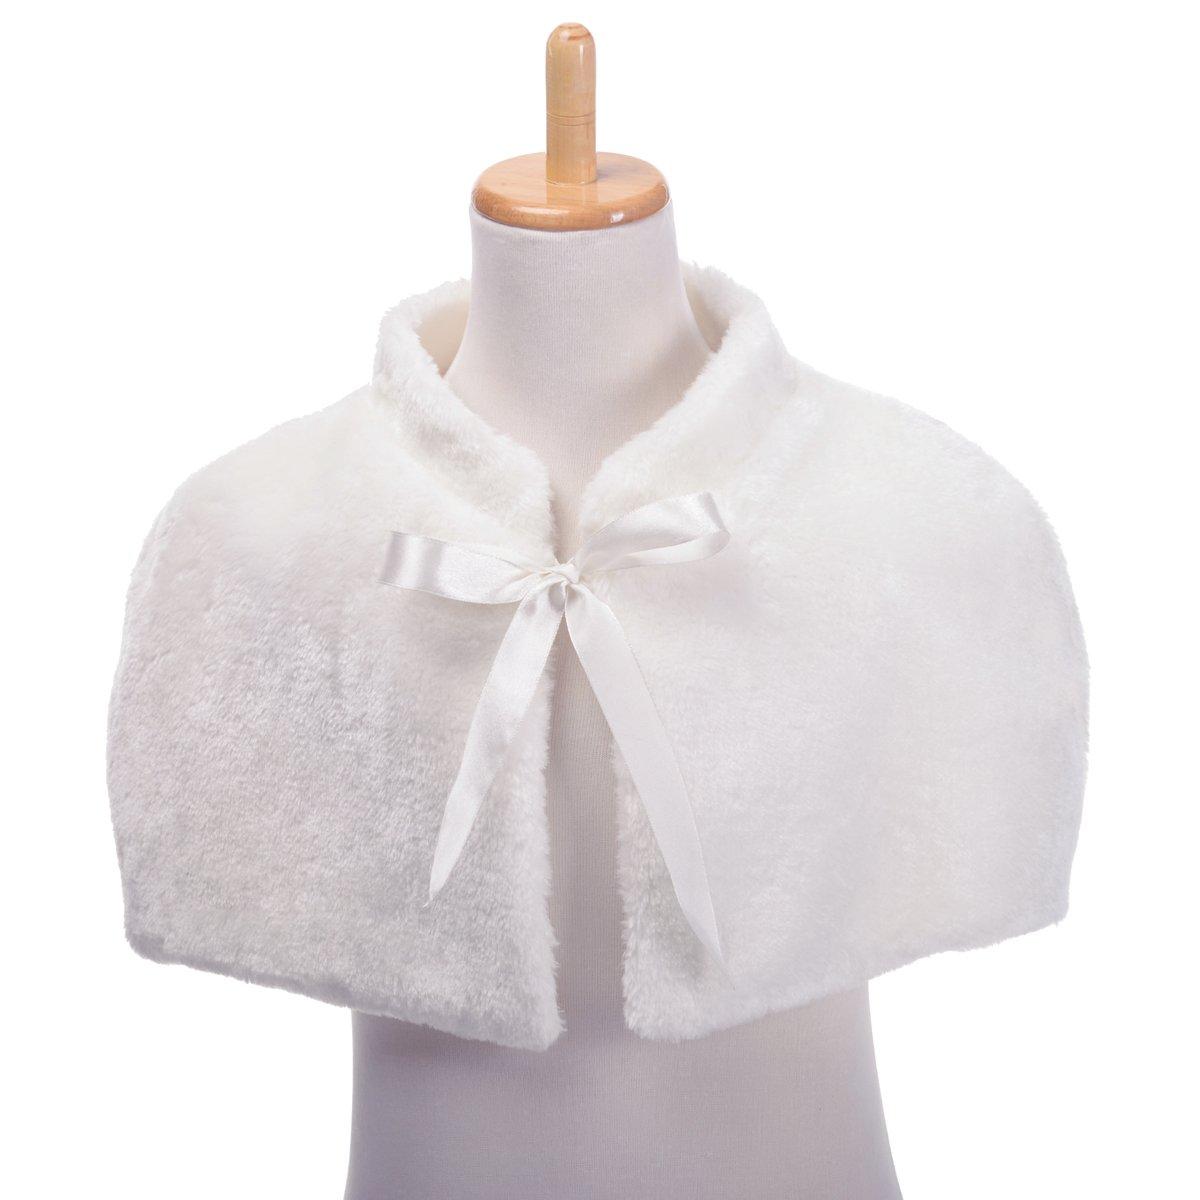 Remedios Ivory Flower Girl Wedding Party Wrap Bolero Jacket Cape w Ribbon, S